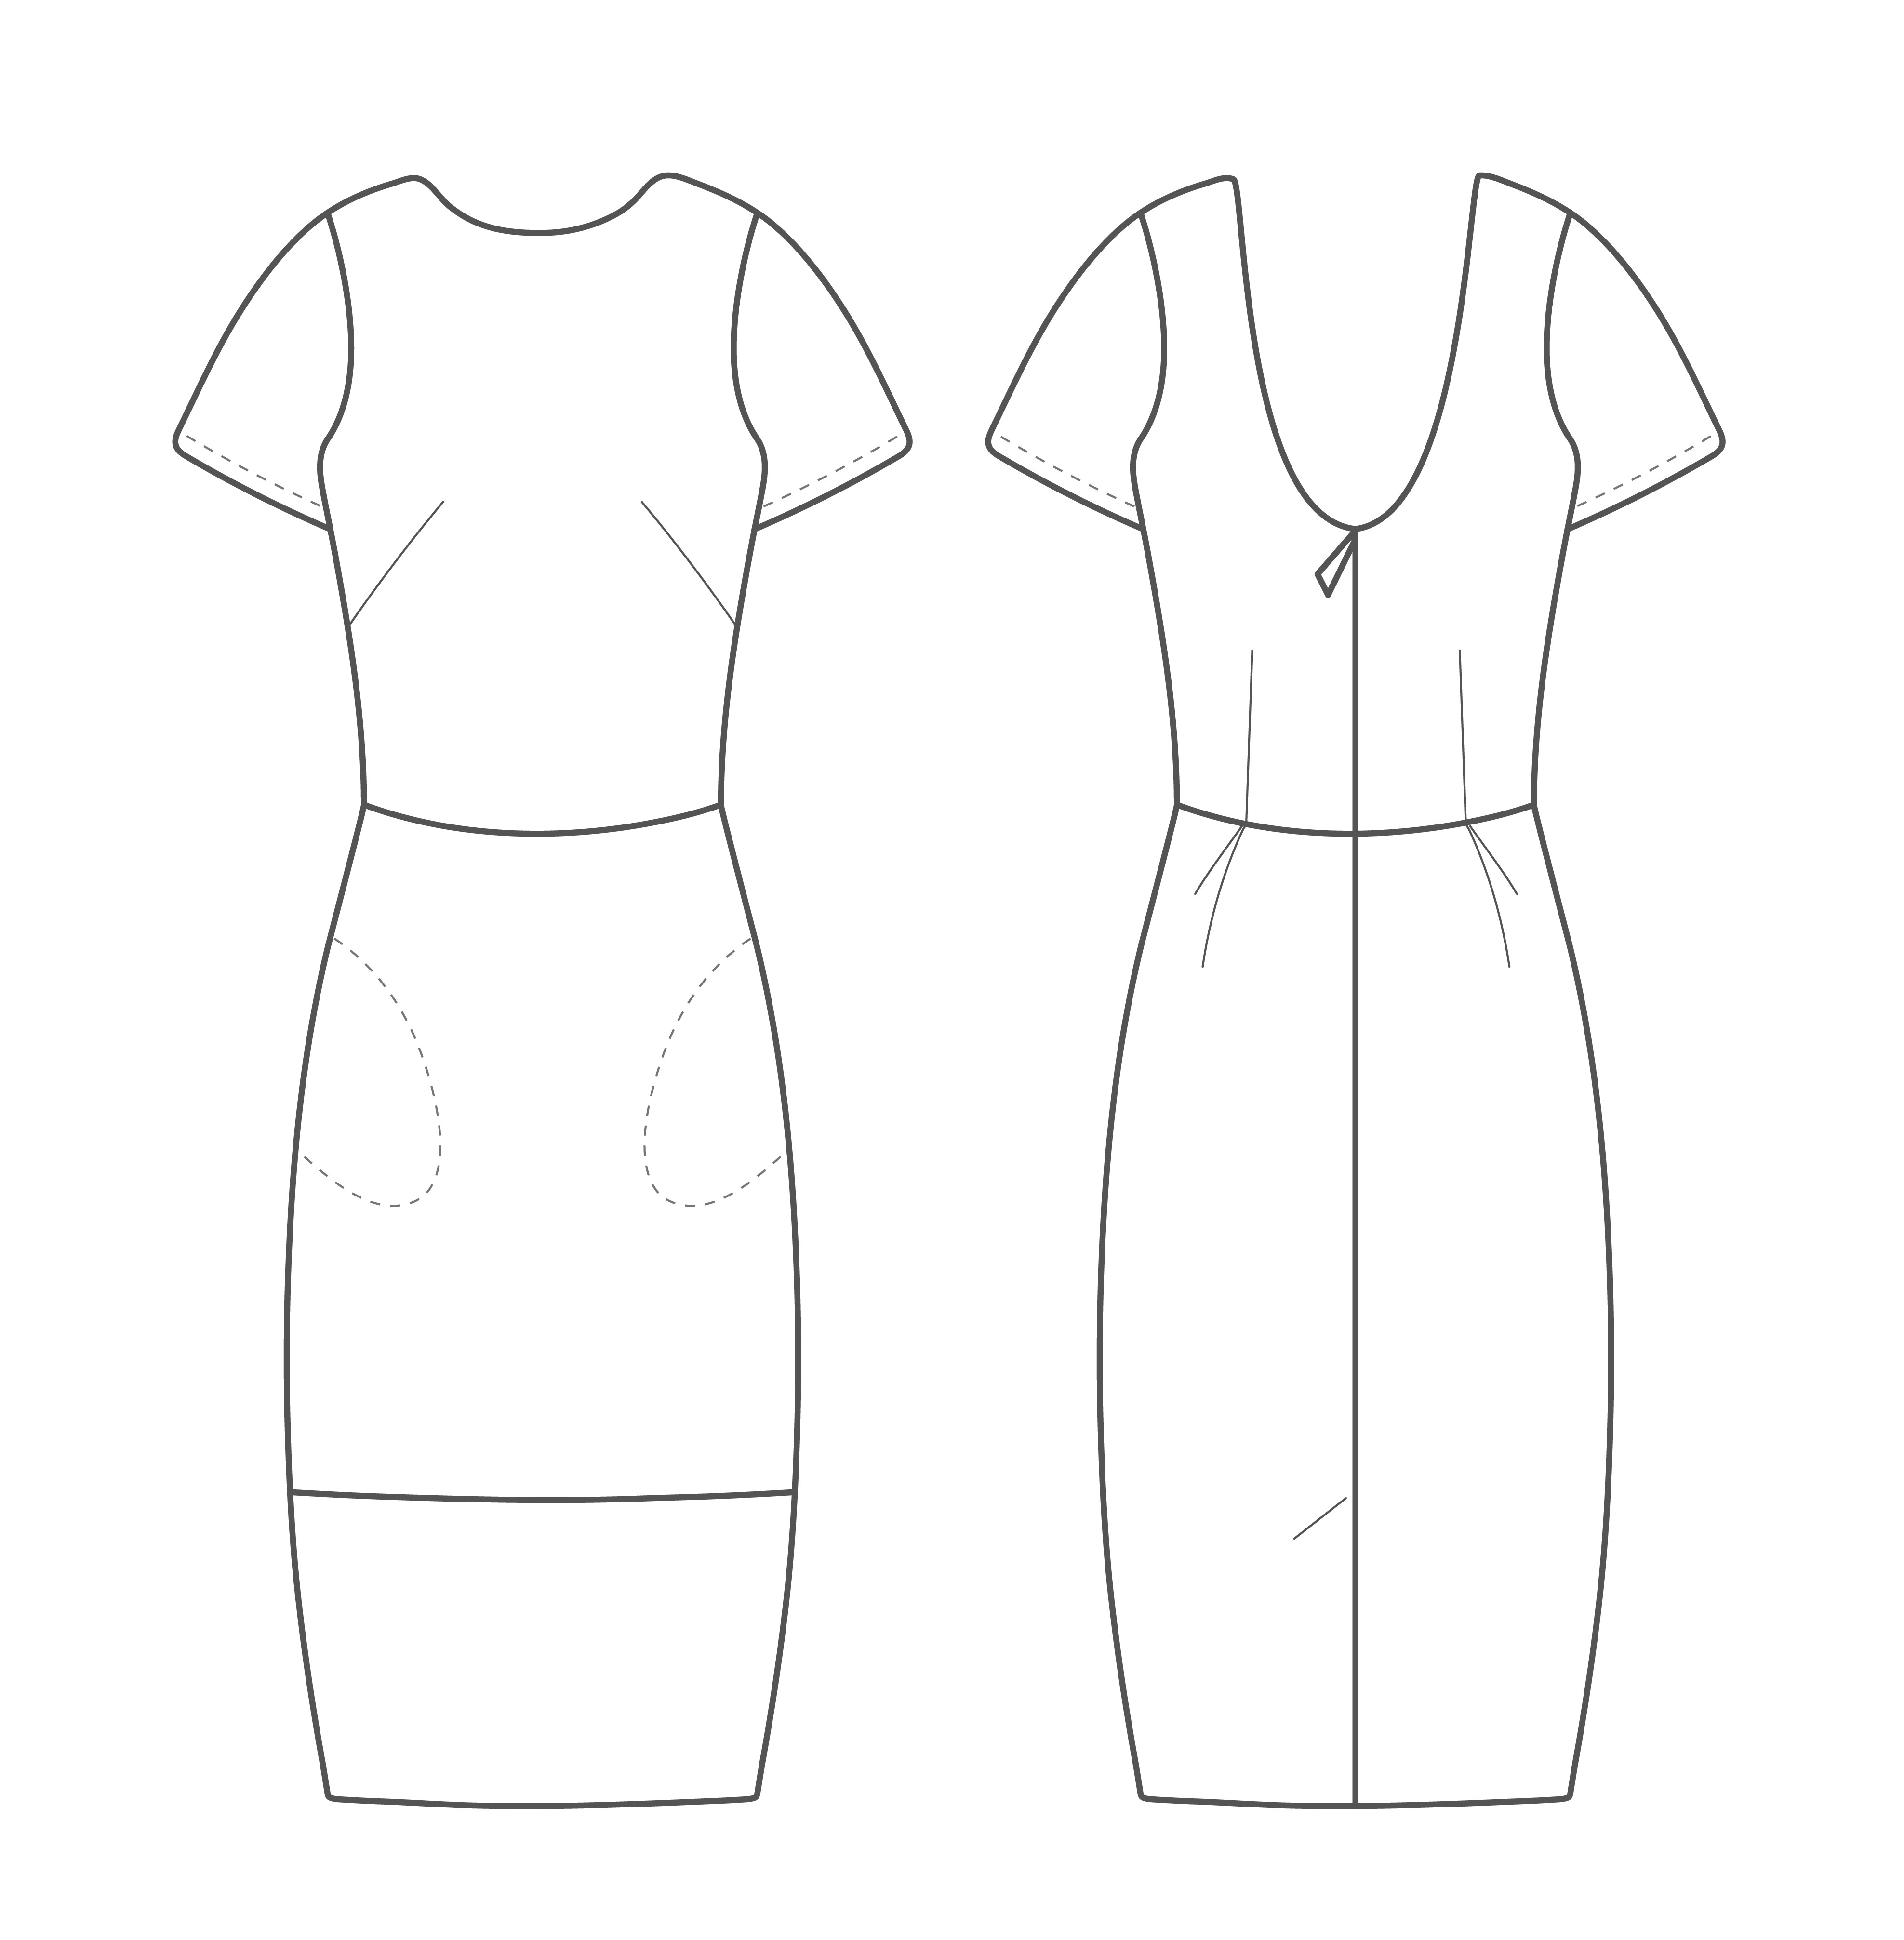 The Shift Dress Kids Sewing Pattern - The Avid Seamstress ...